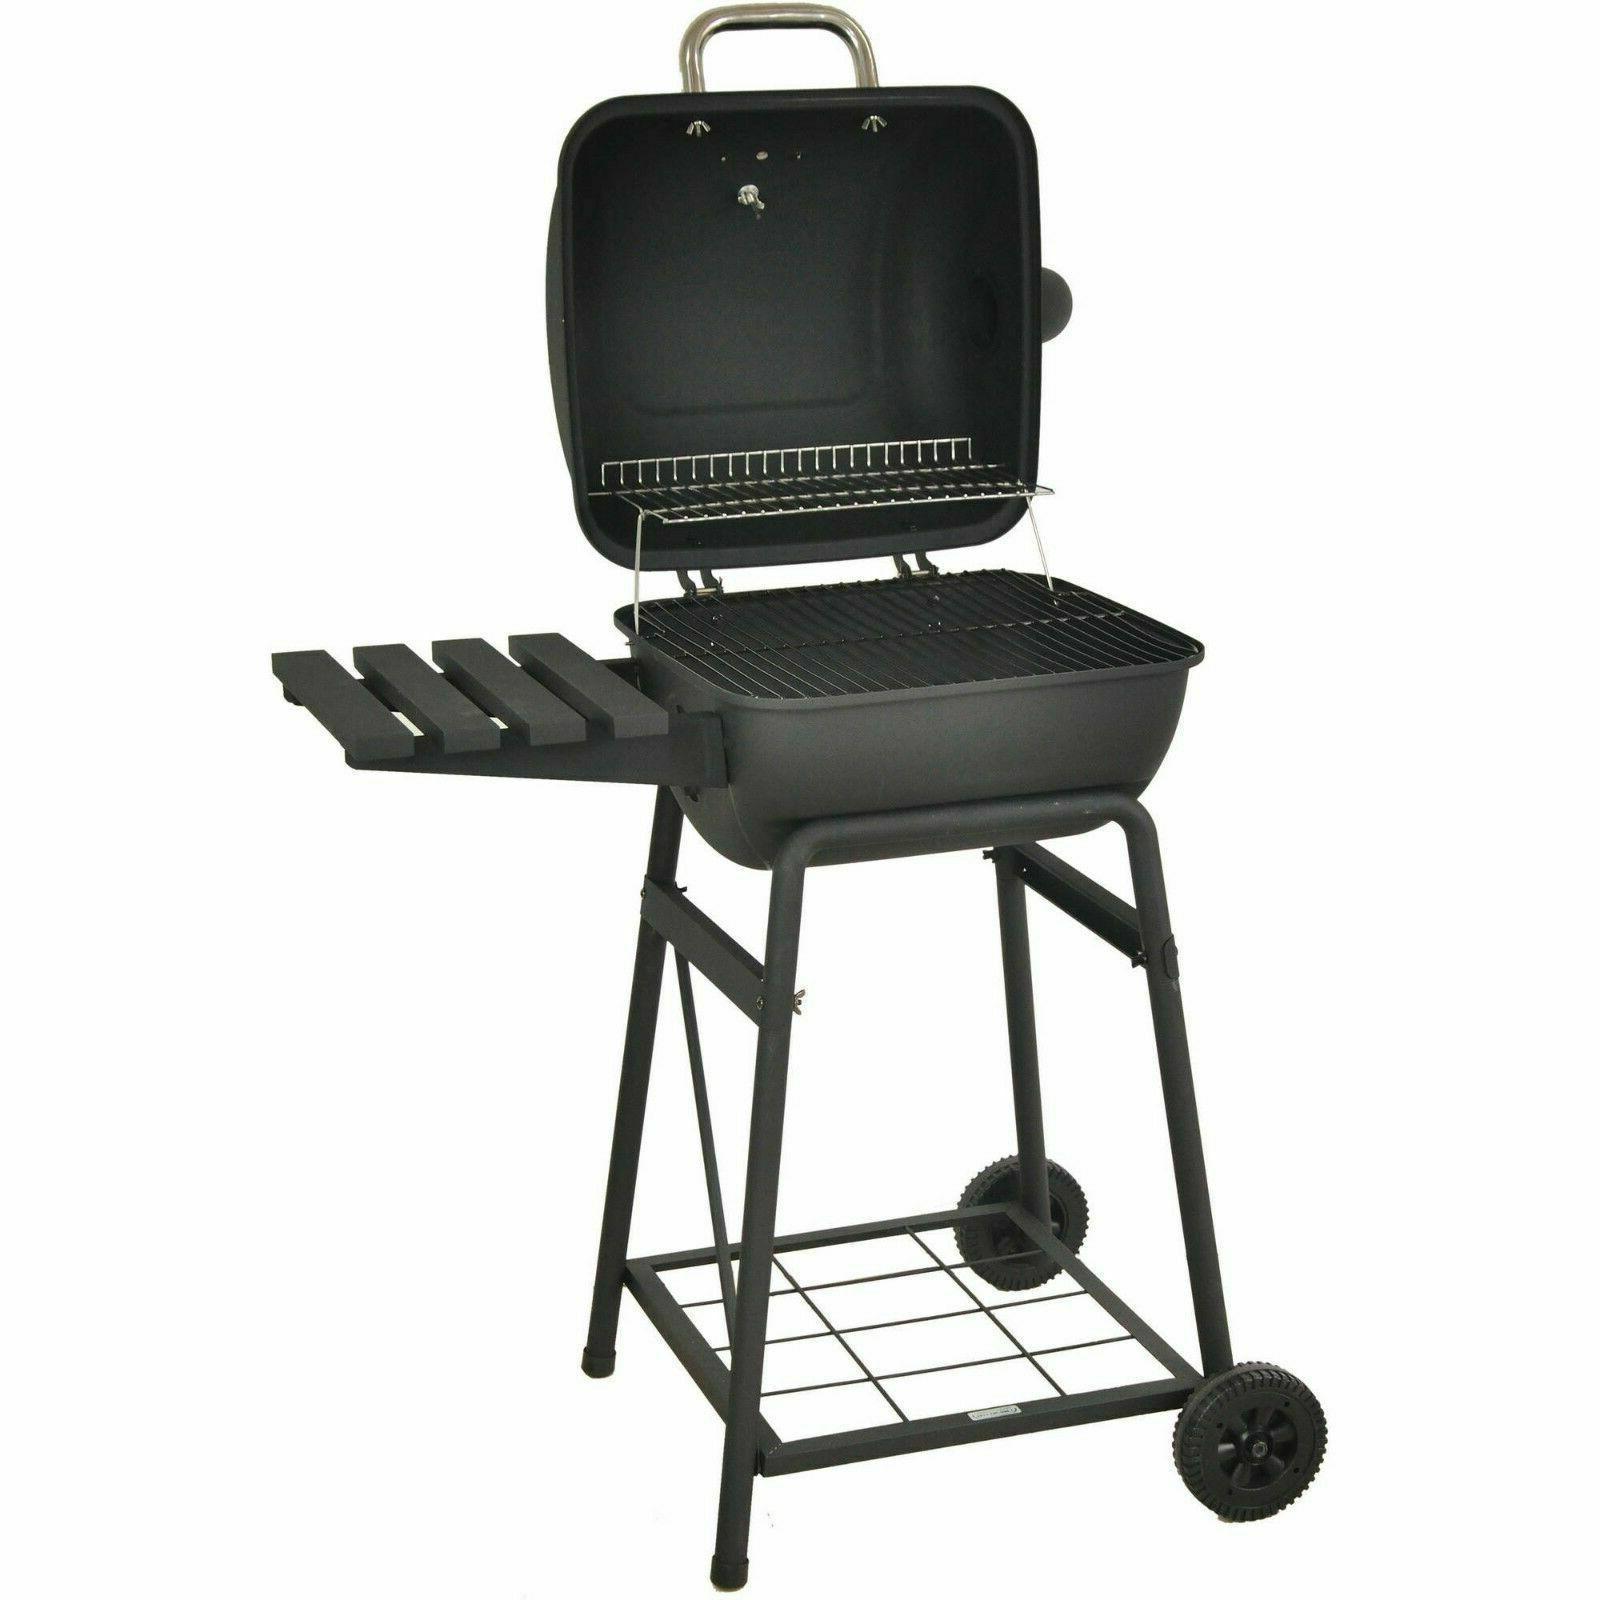 "Charcoal 26"" Barrel BBQ Backyard Outdoor"